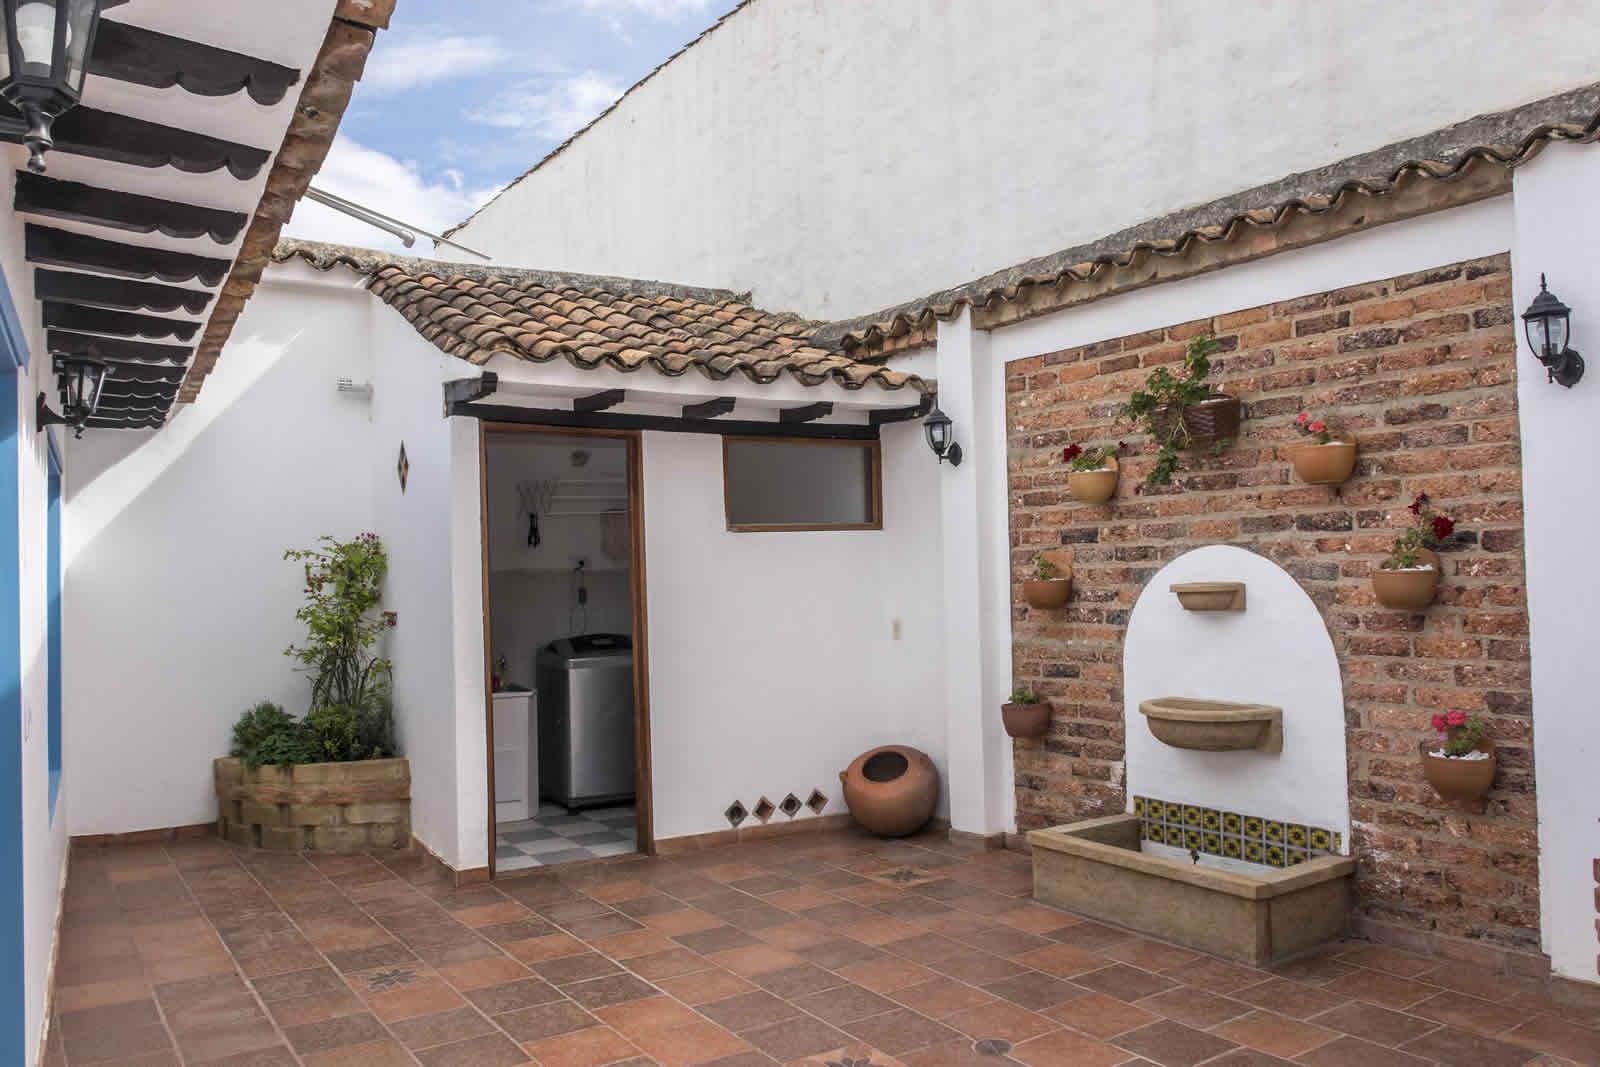 Alquiler Casa Azul en Villa de Leyva patio